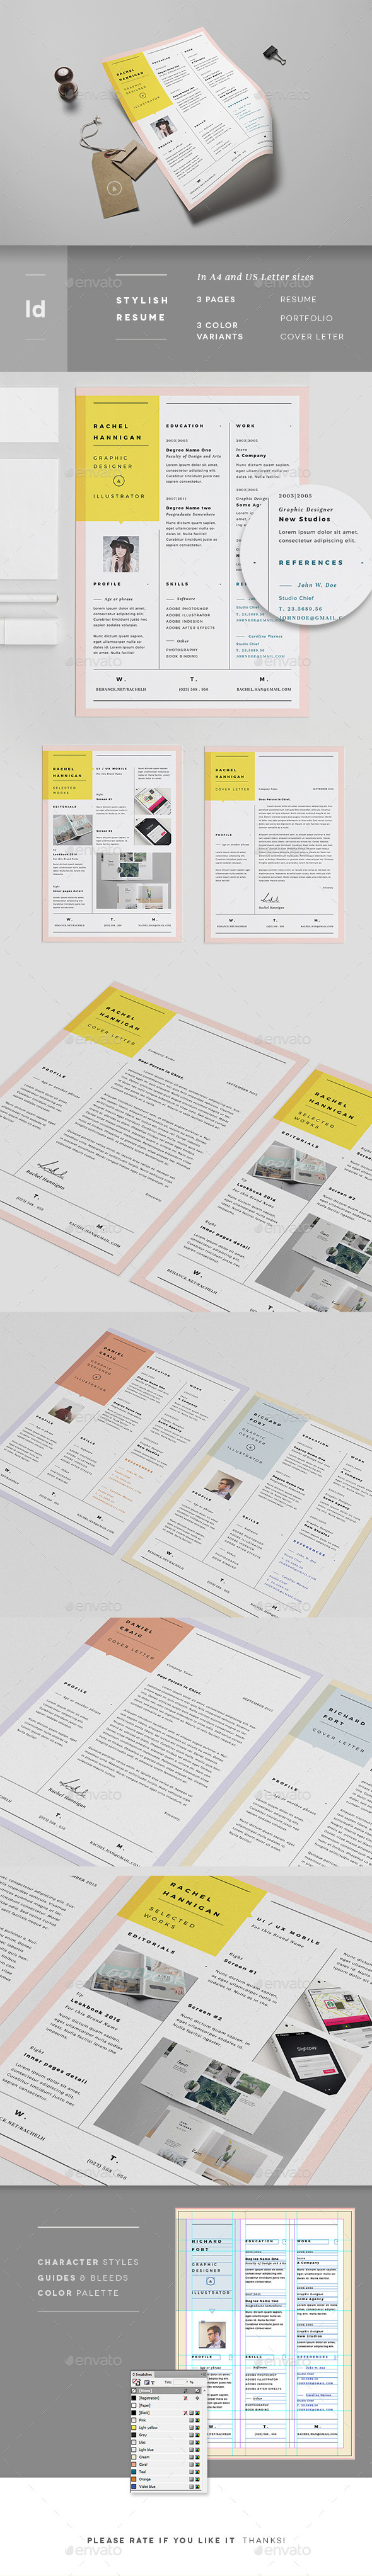 3 Pages Minimal Resume Portfolio & Letter